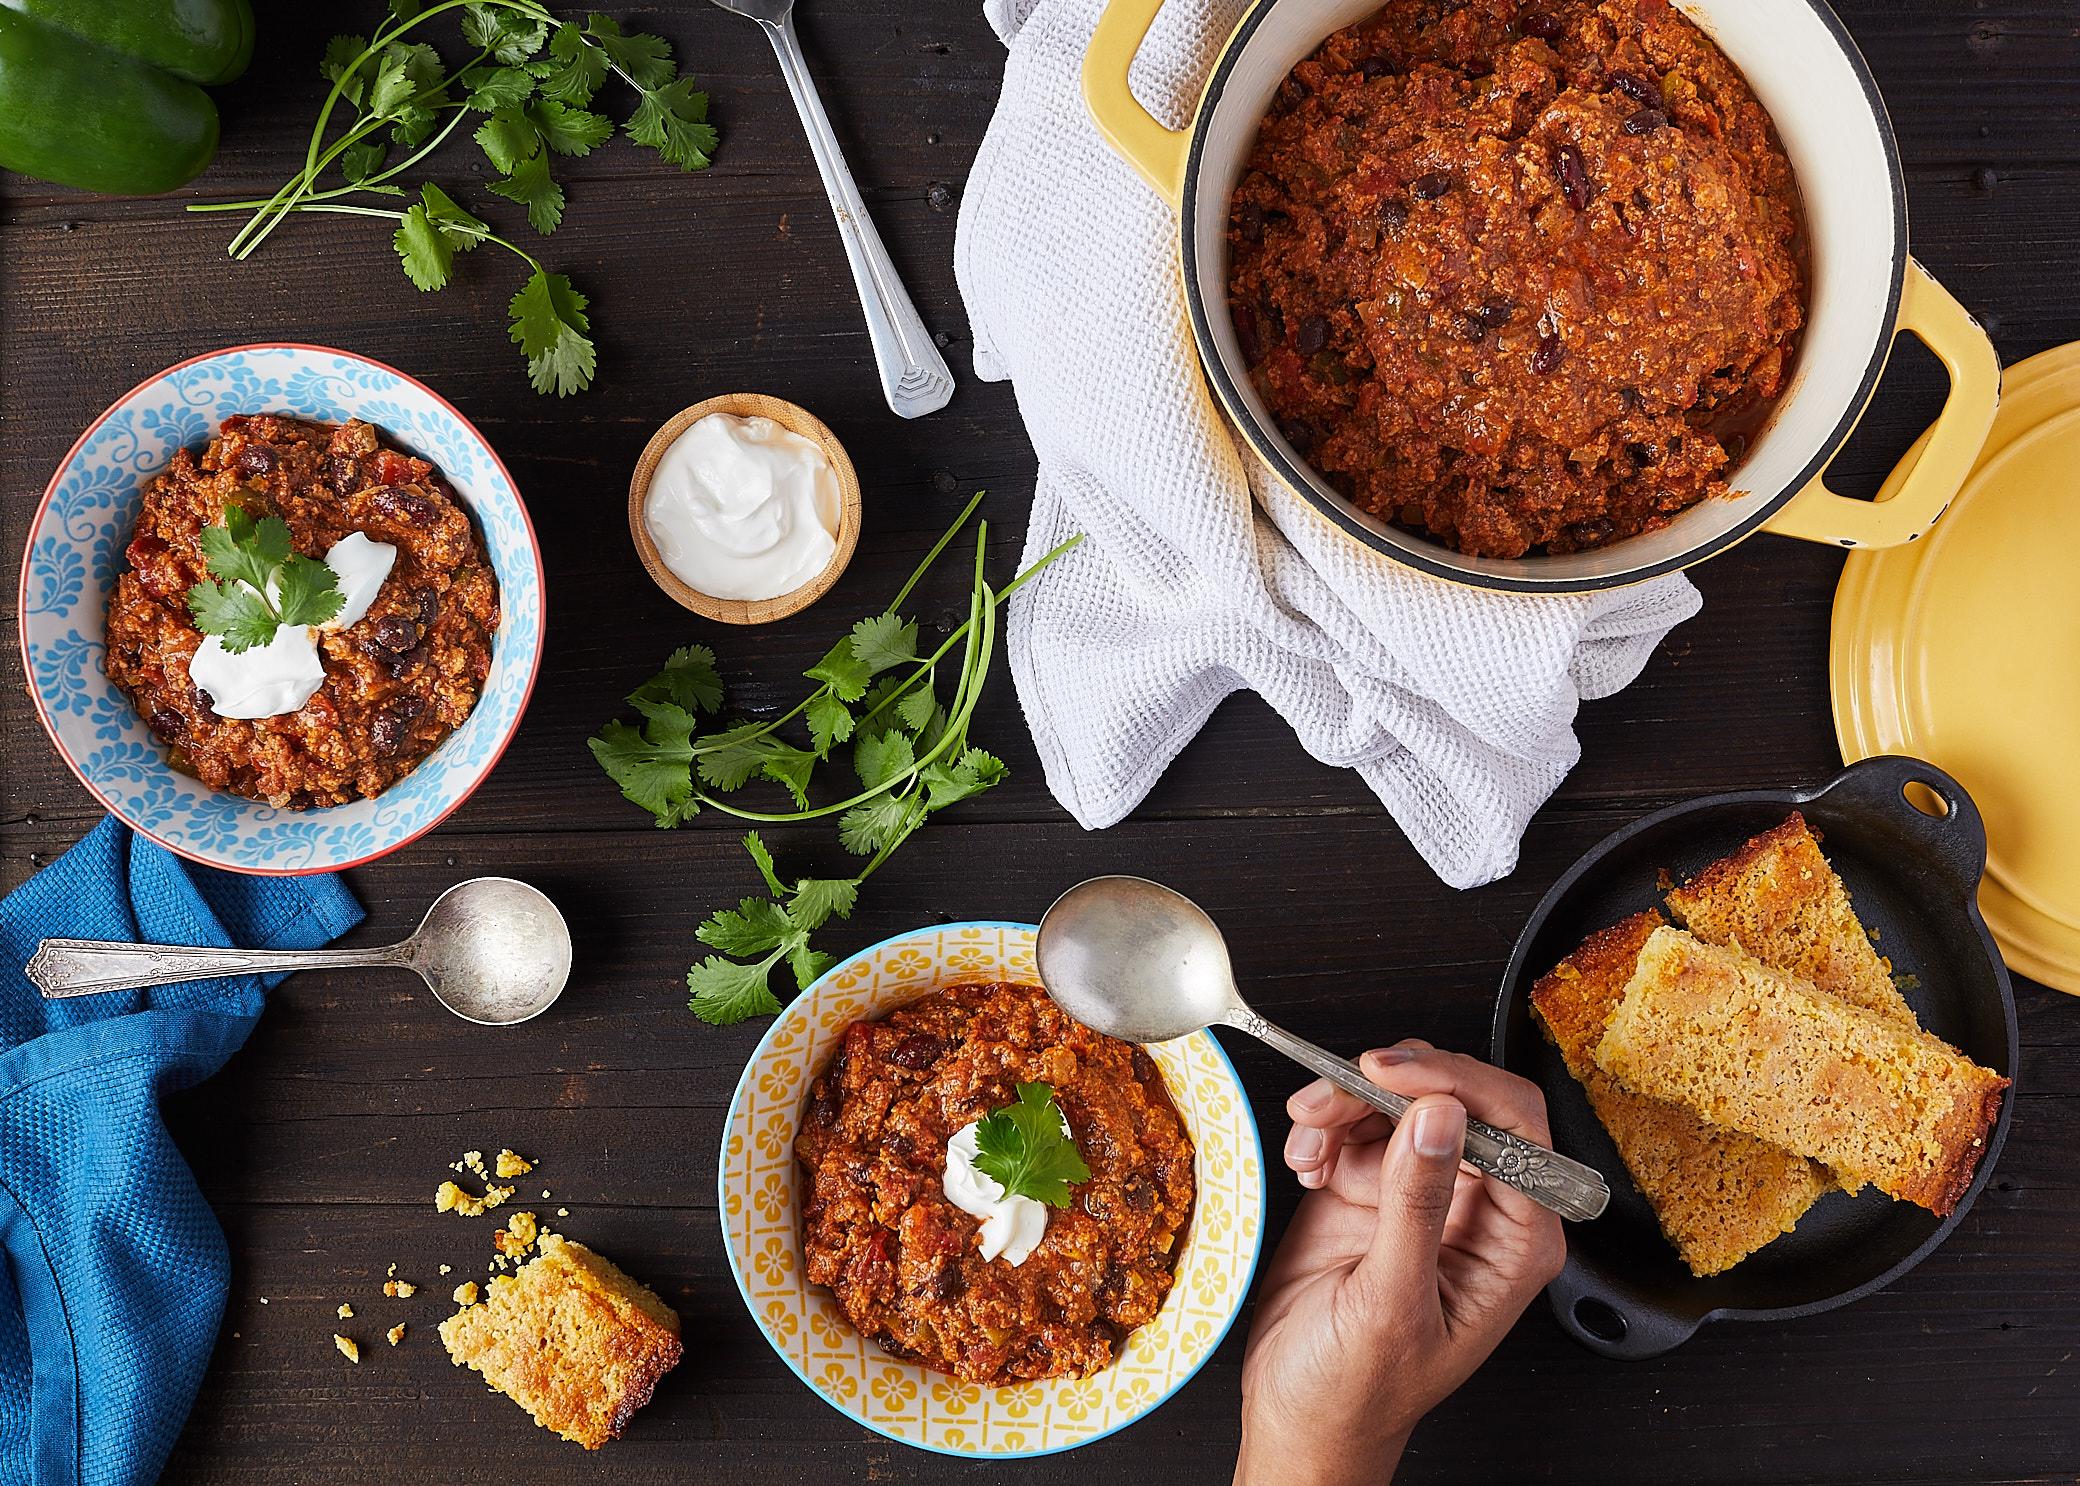 MV-Food Photography Testing11552.jpg